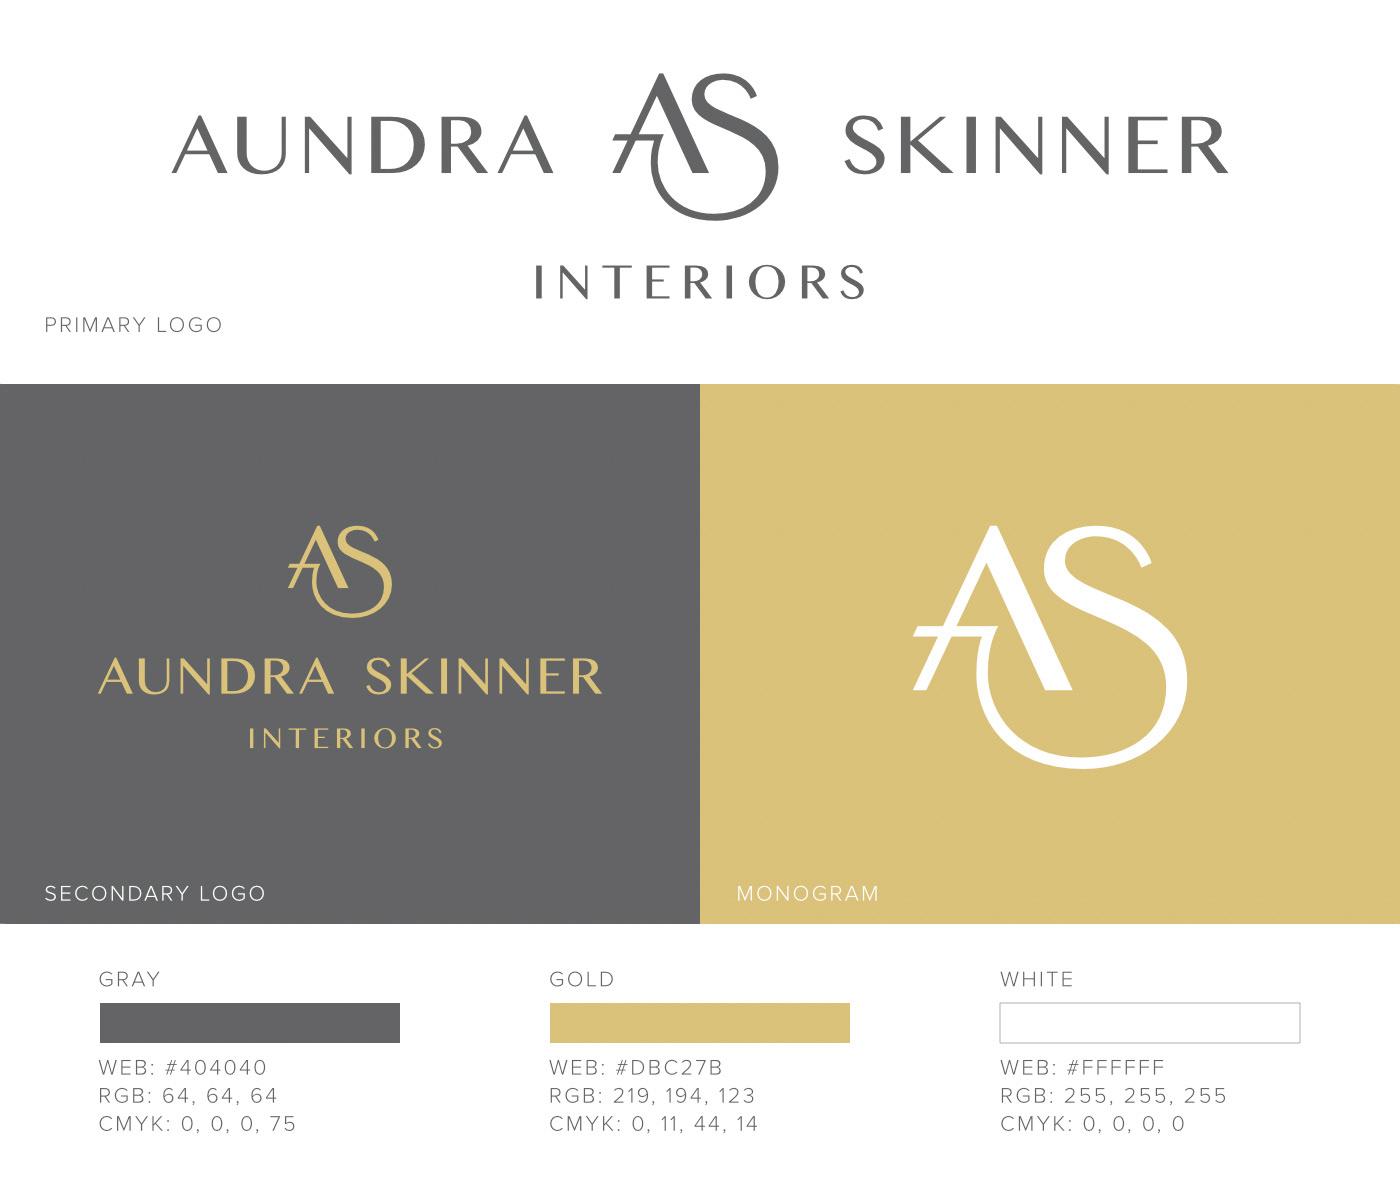 kyle chicoine graphic designer aundra skinner interiors